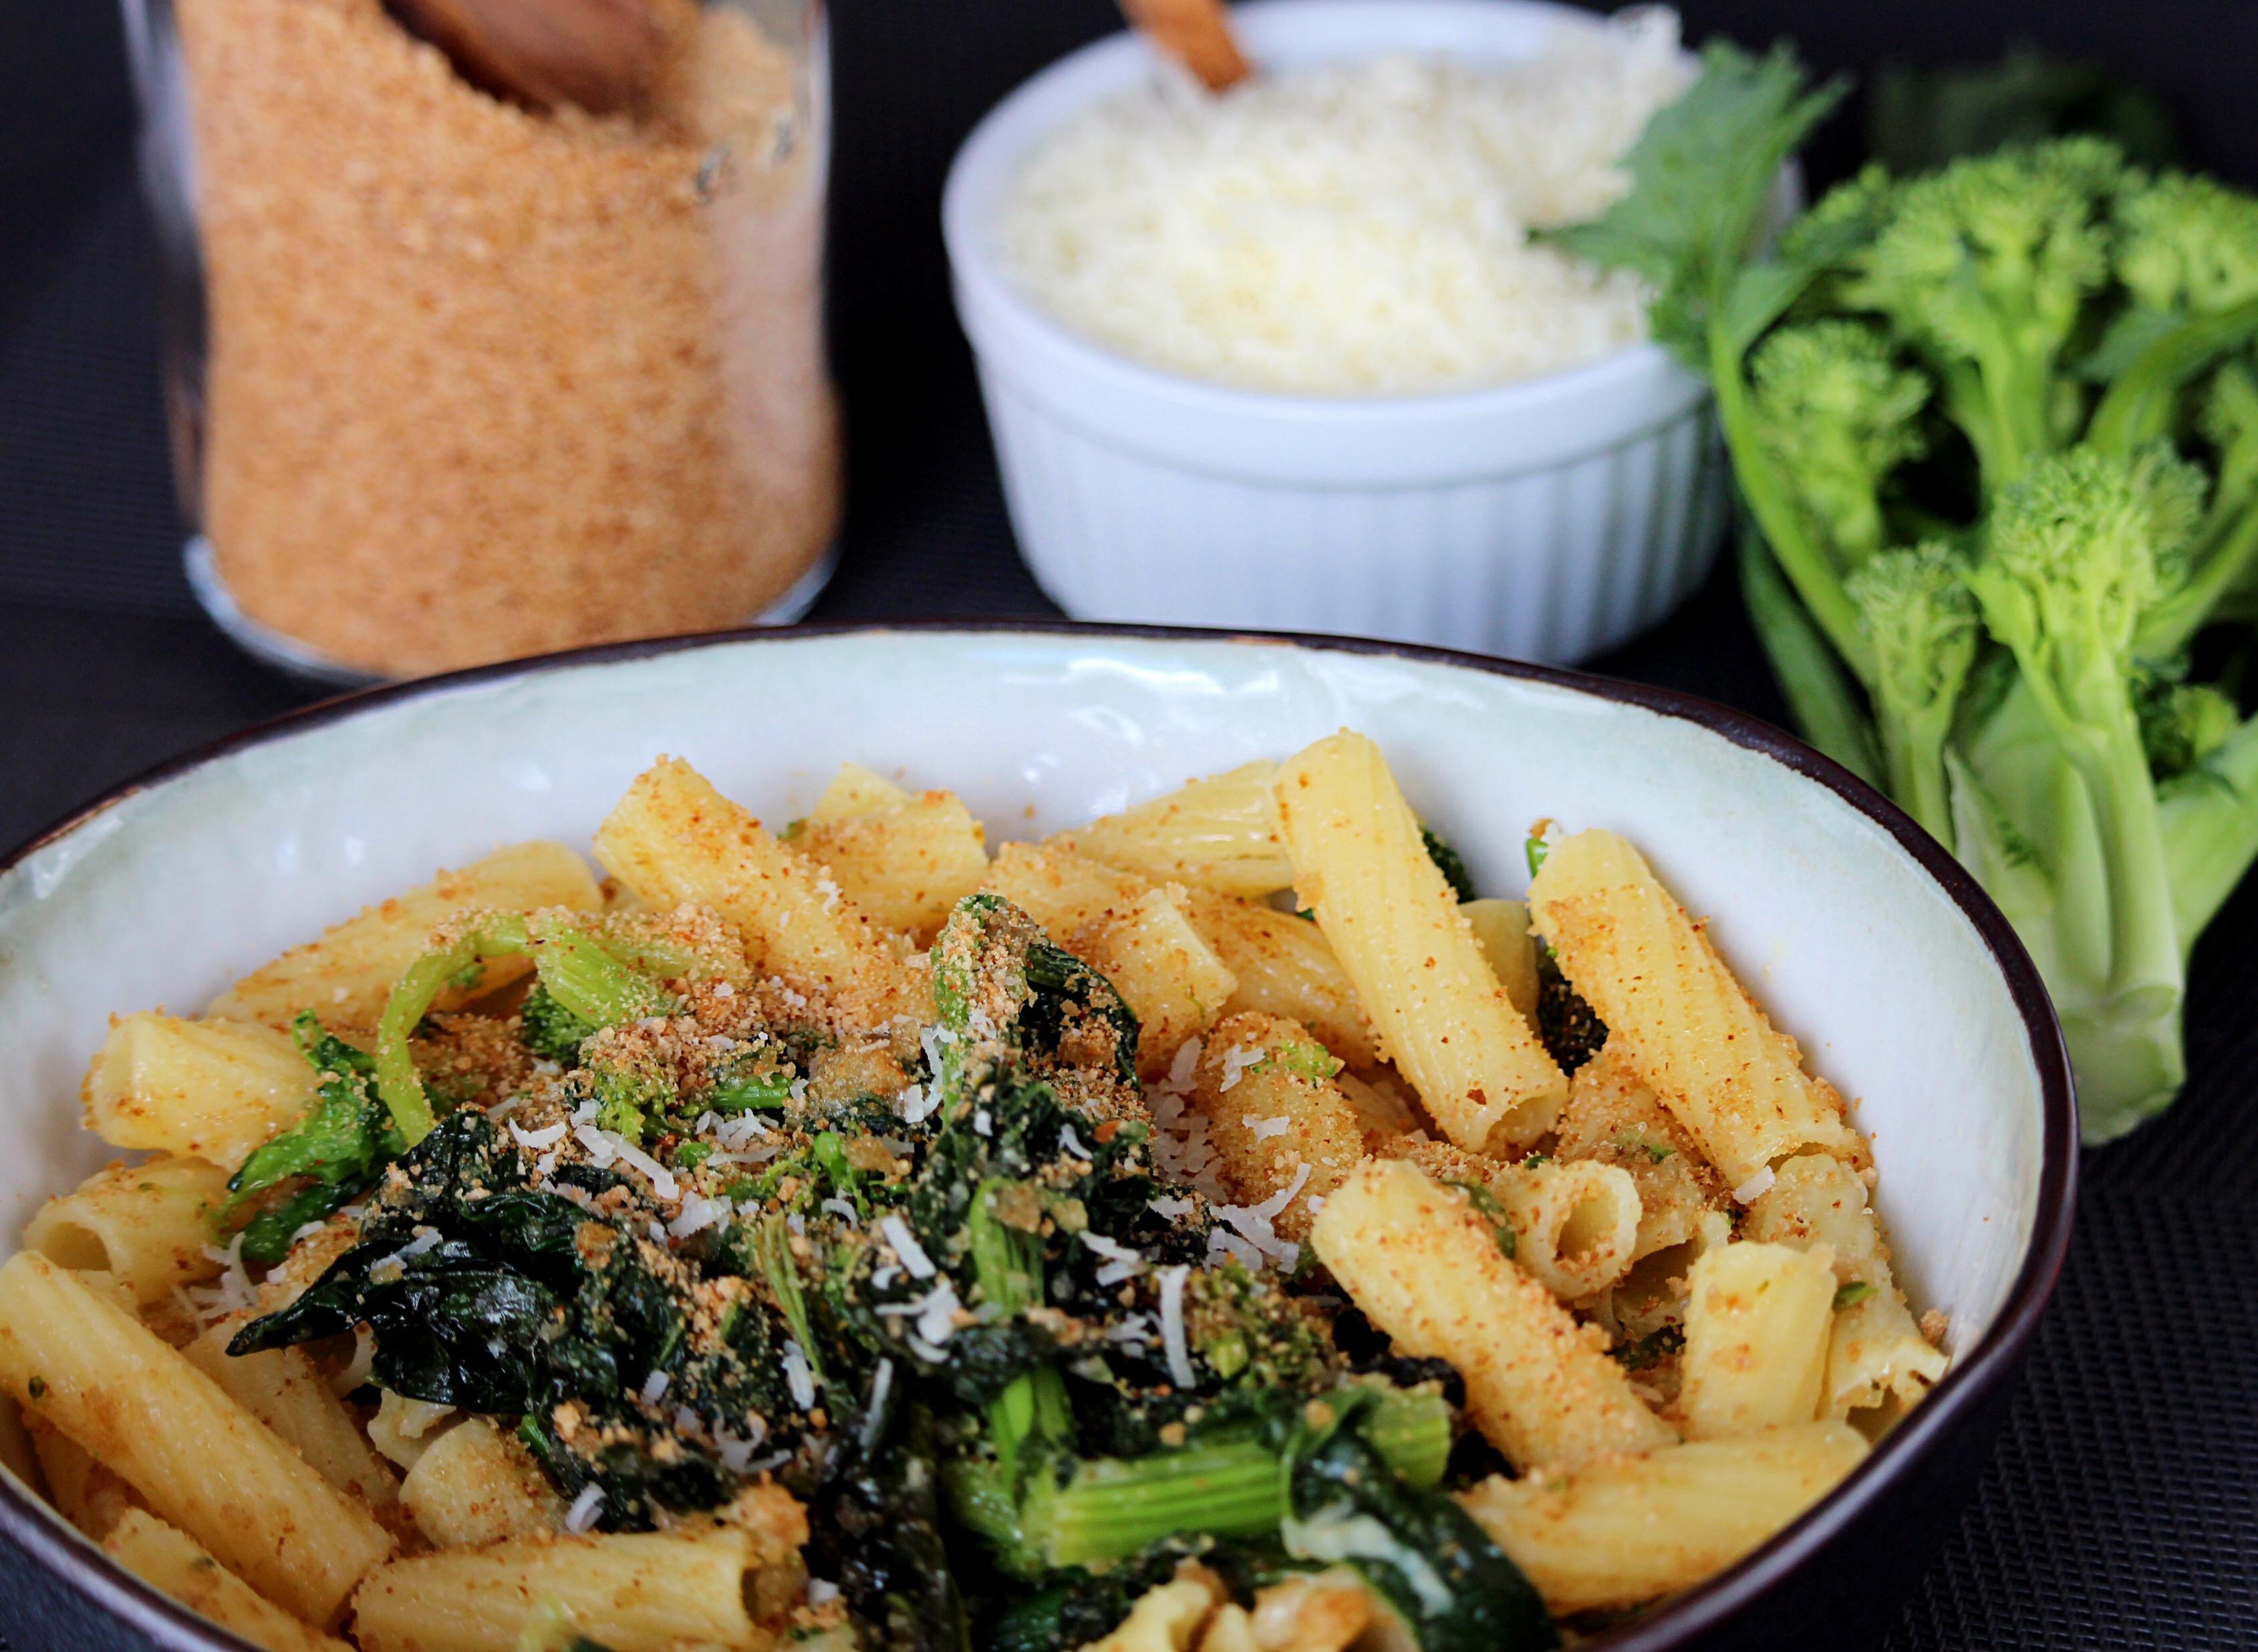 Pasta with Broccoli Rabe (Cima di Rapa) Buckwheat Queen